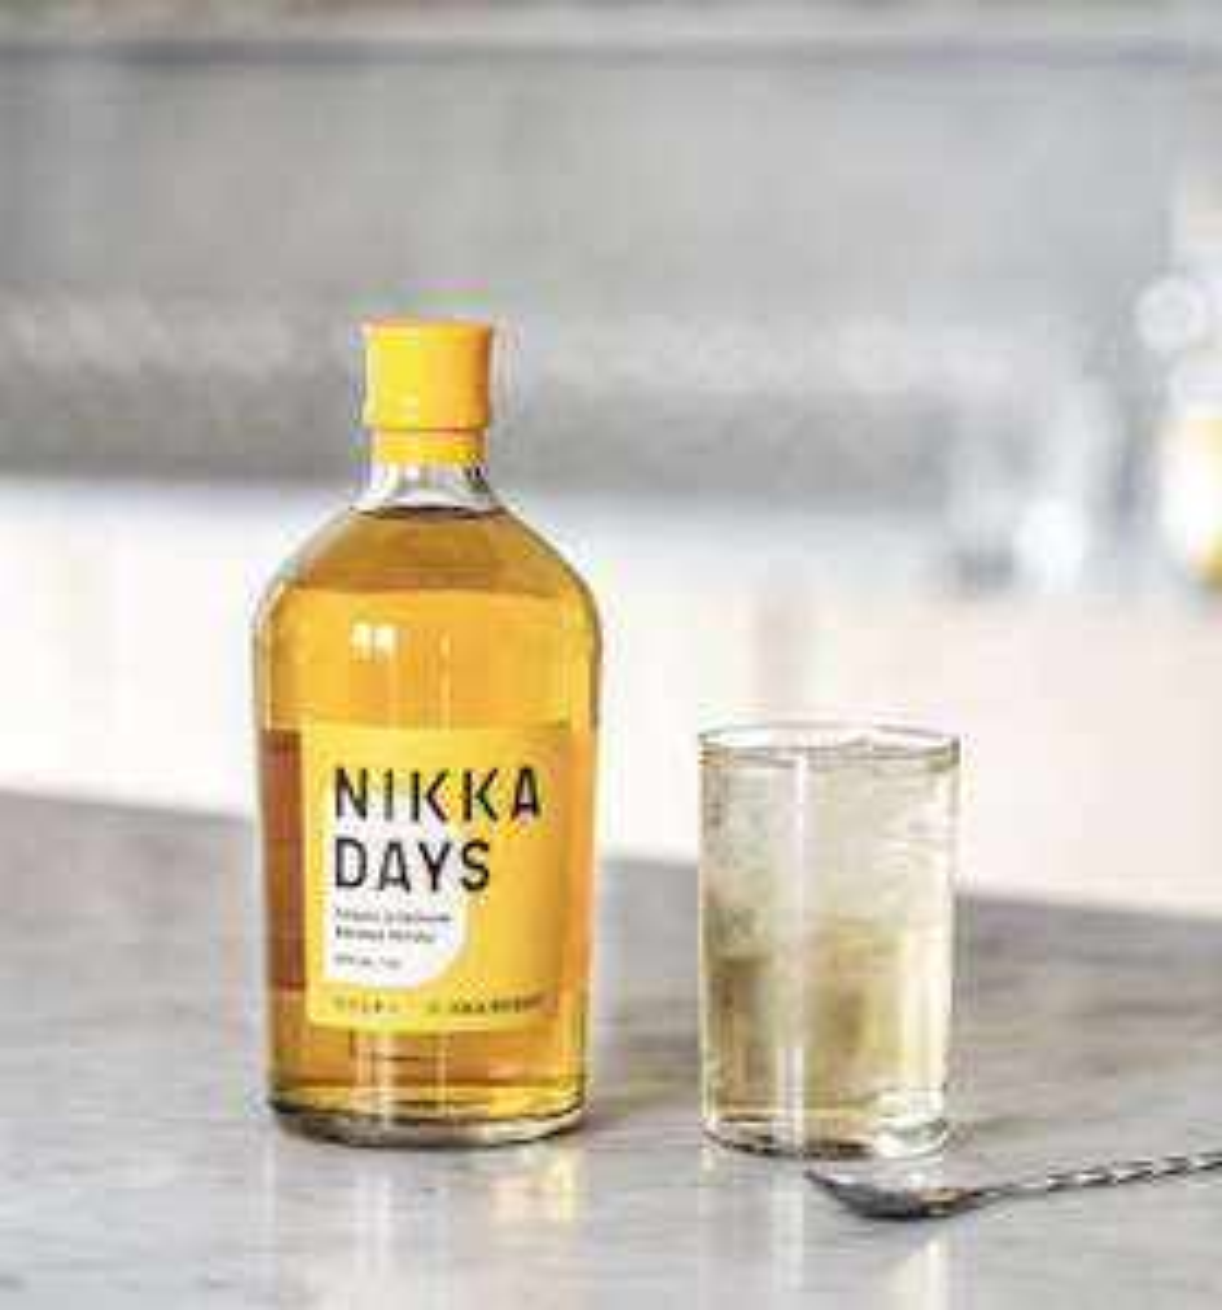 Nikka Days Blended Japanese Whisky, 70cl, 40% ABV £31.95 / £30.35 S&S at Amazon